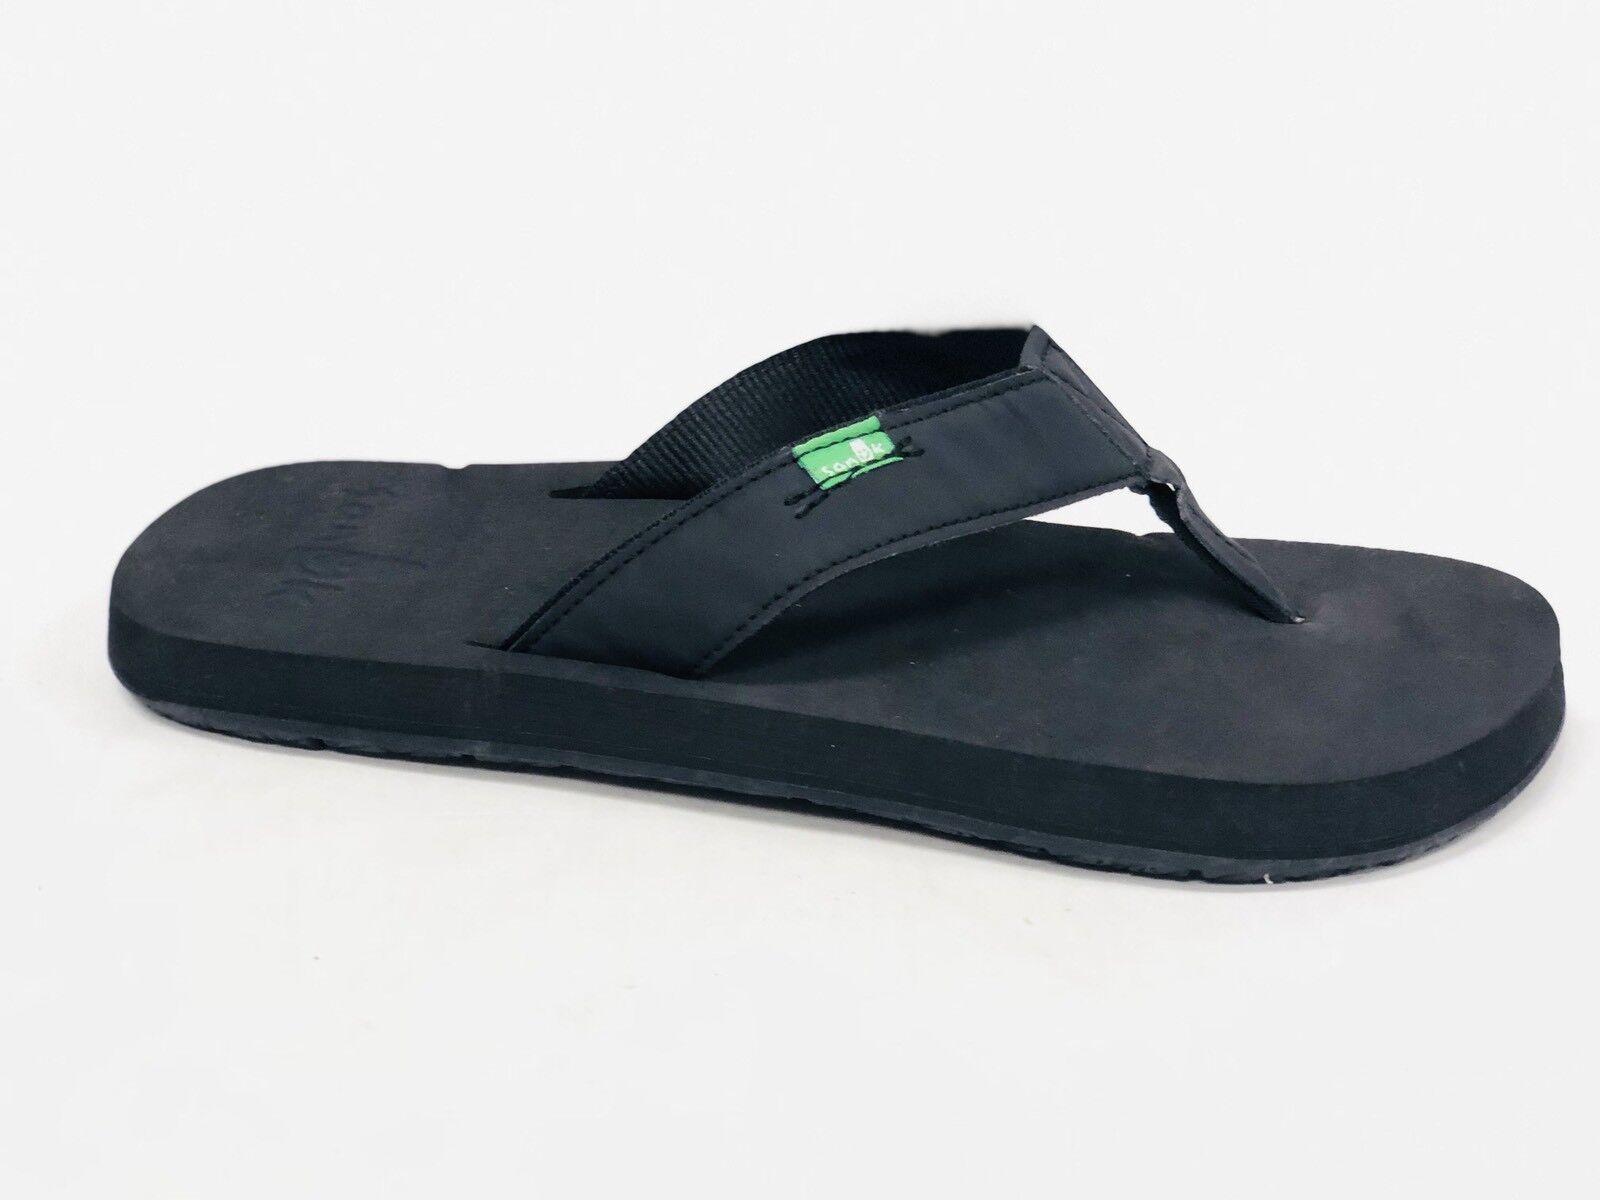 2cf60d8cc89e Sanuk Men s LONGITUDE BLACKOUT BLACKOUT BLACKOUT Casual Flip Flop Slip On  Sandal SMF10614 YOGA MAT f4711d